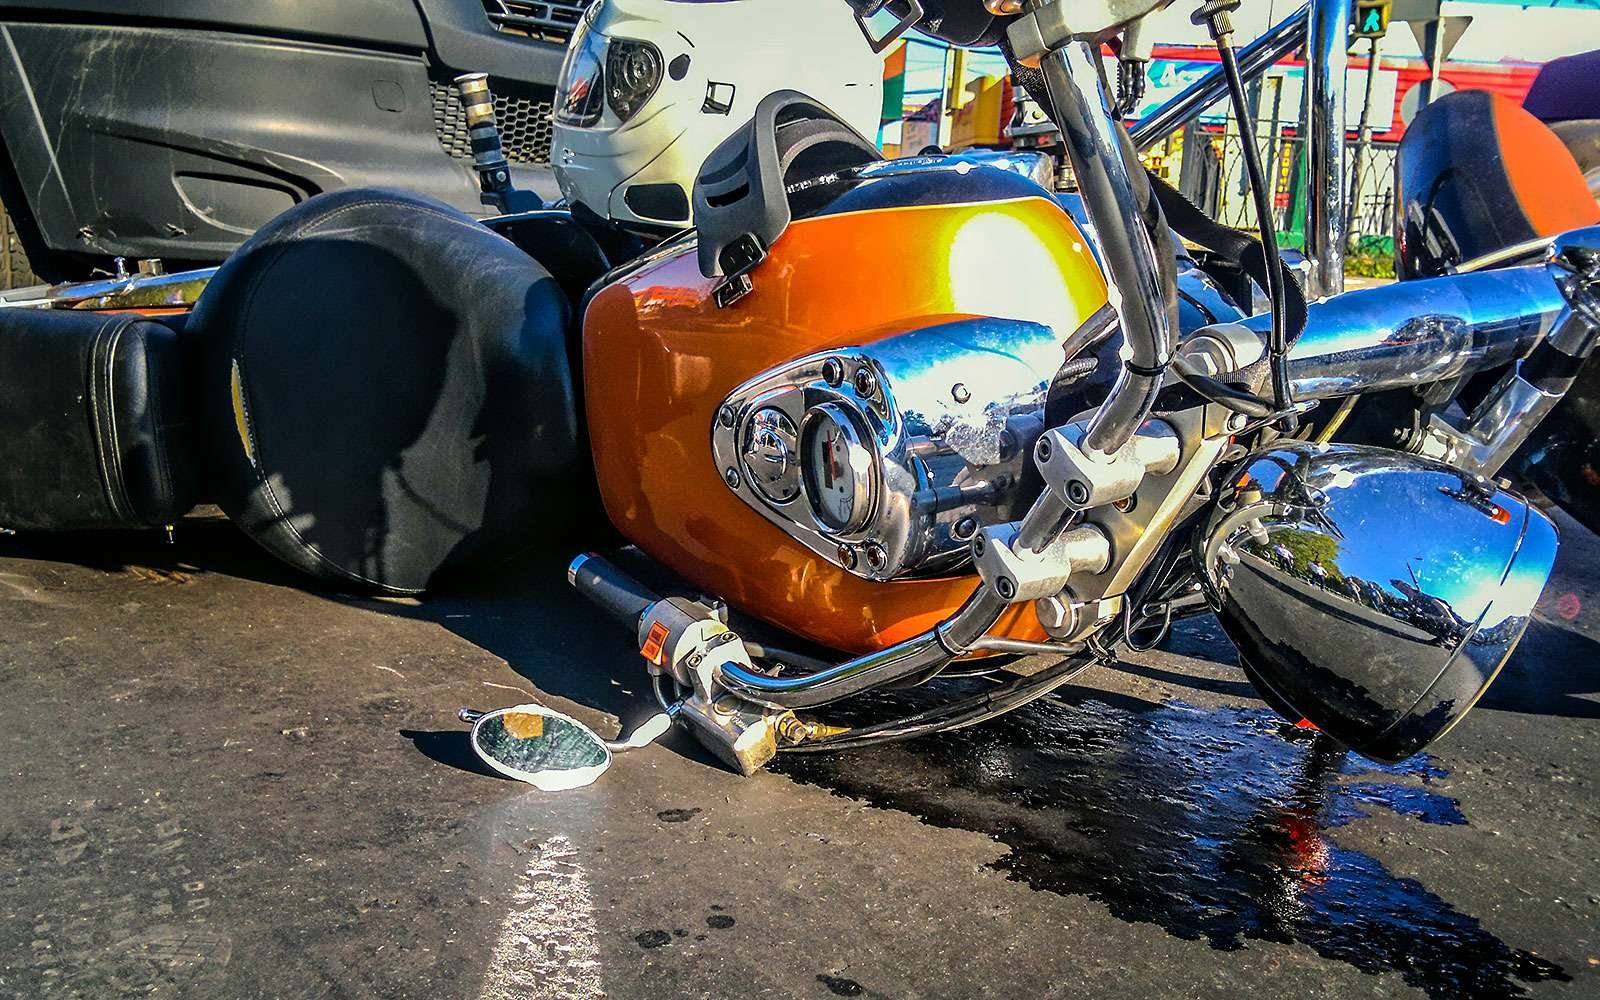 Мотоциклист надороге